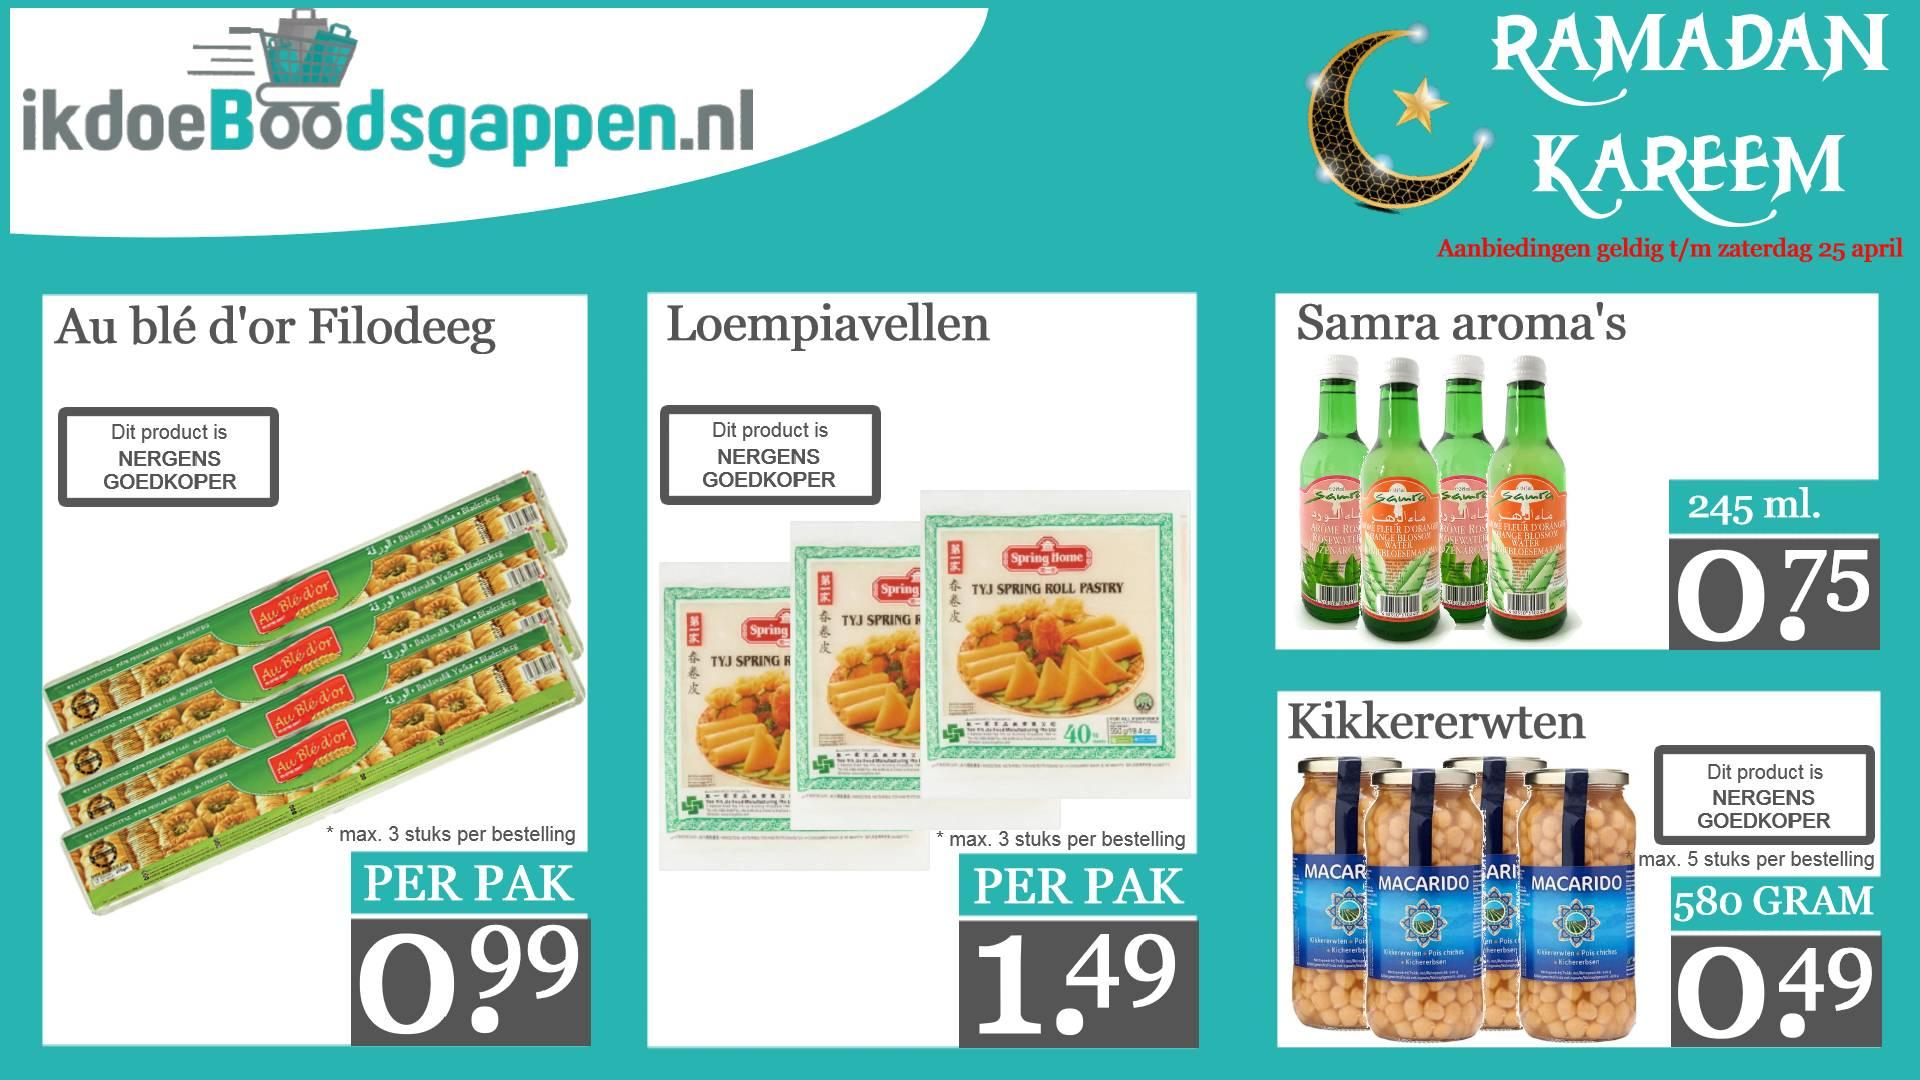 ikdoeboodsgappen.nl